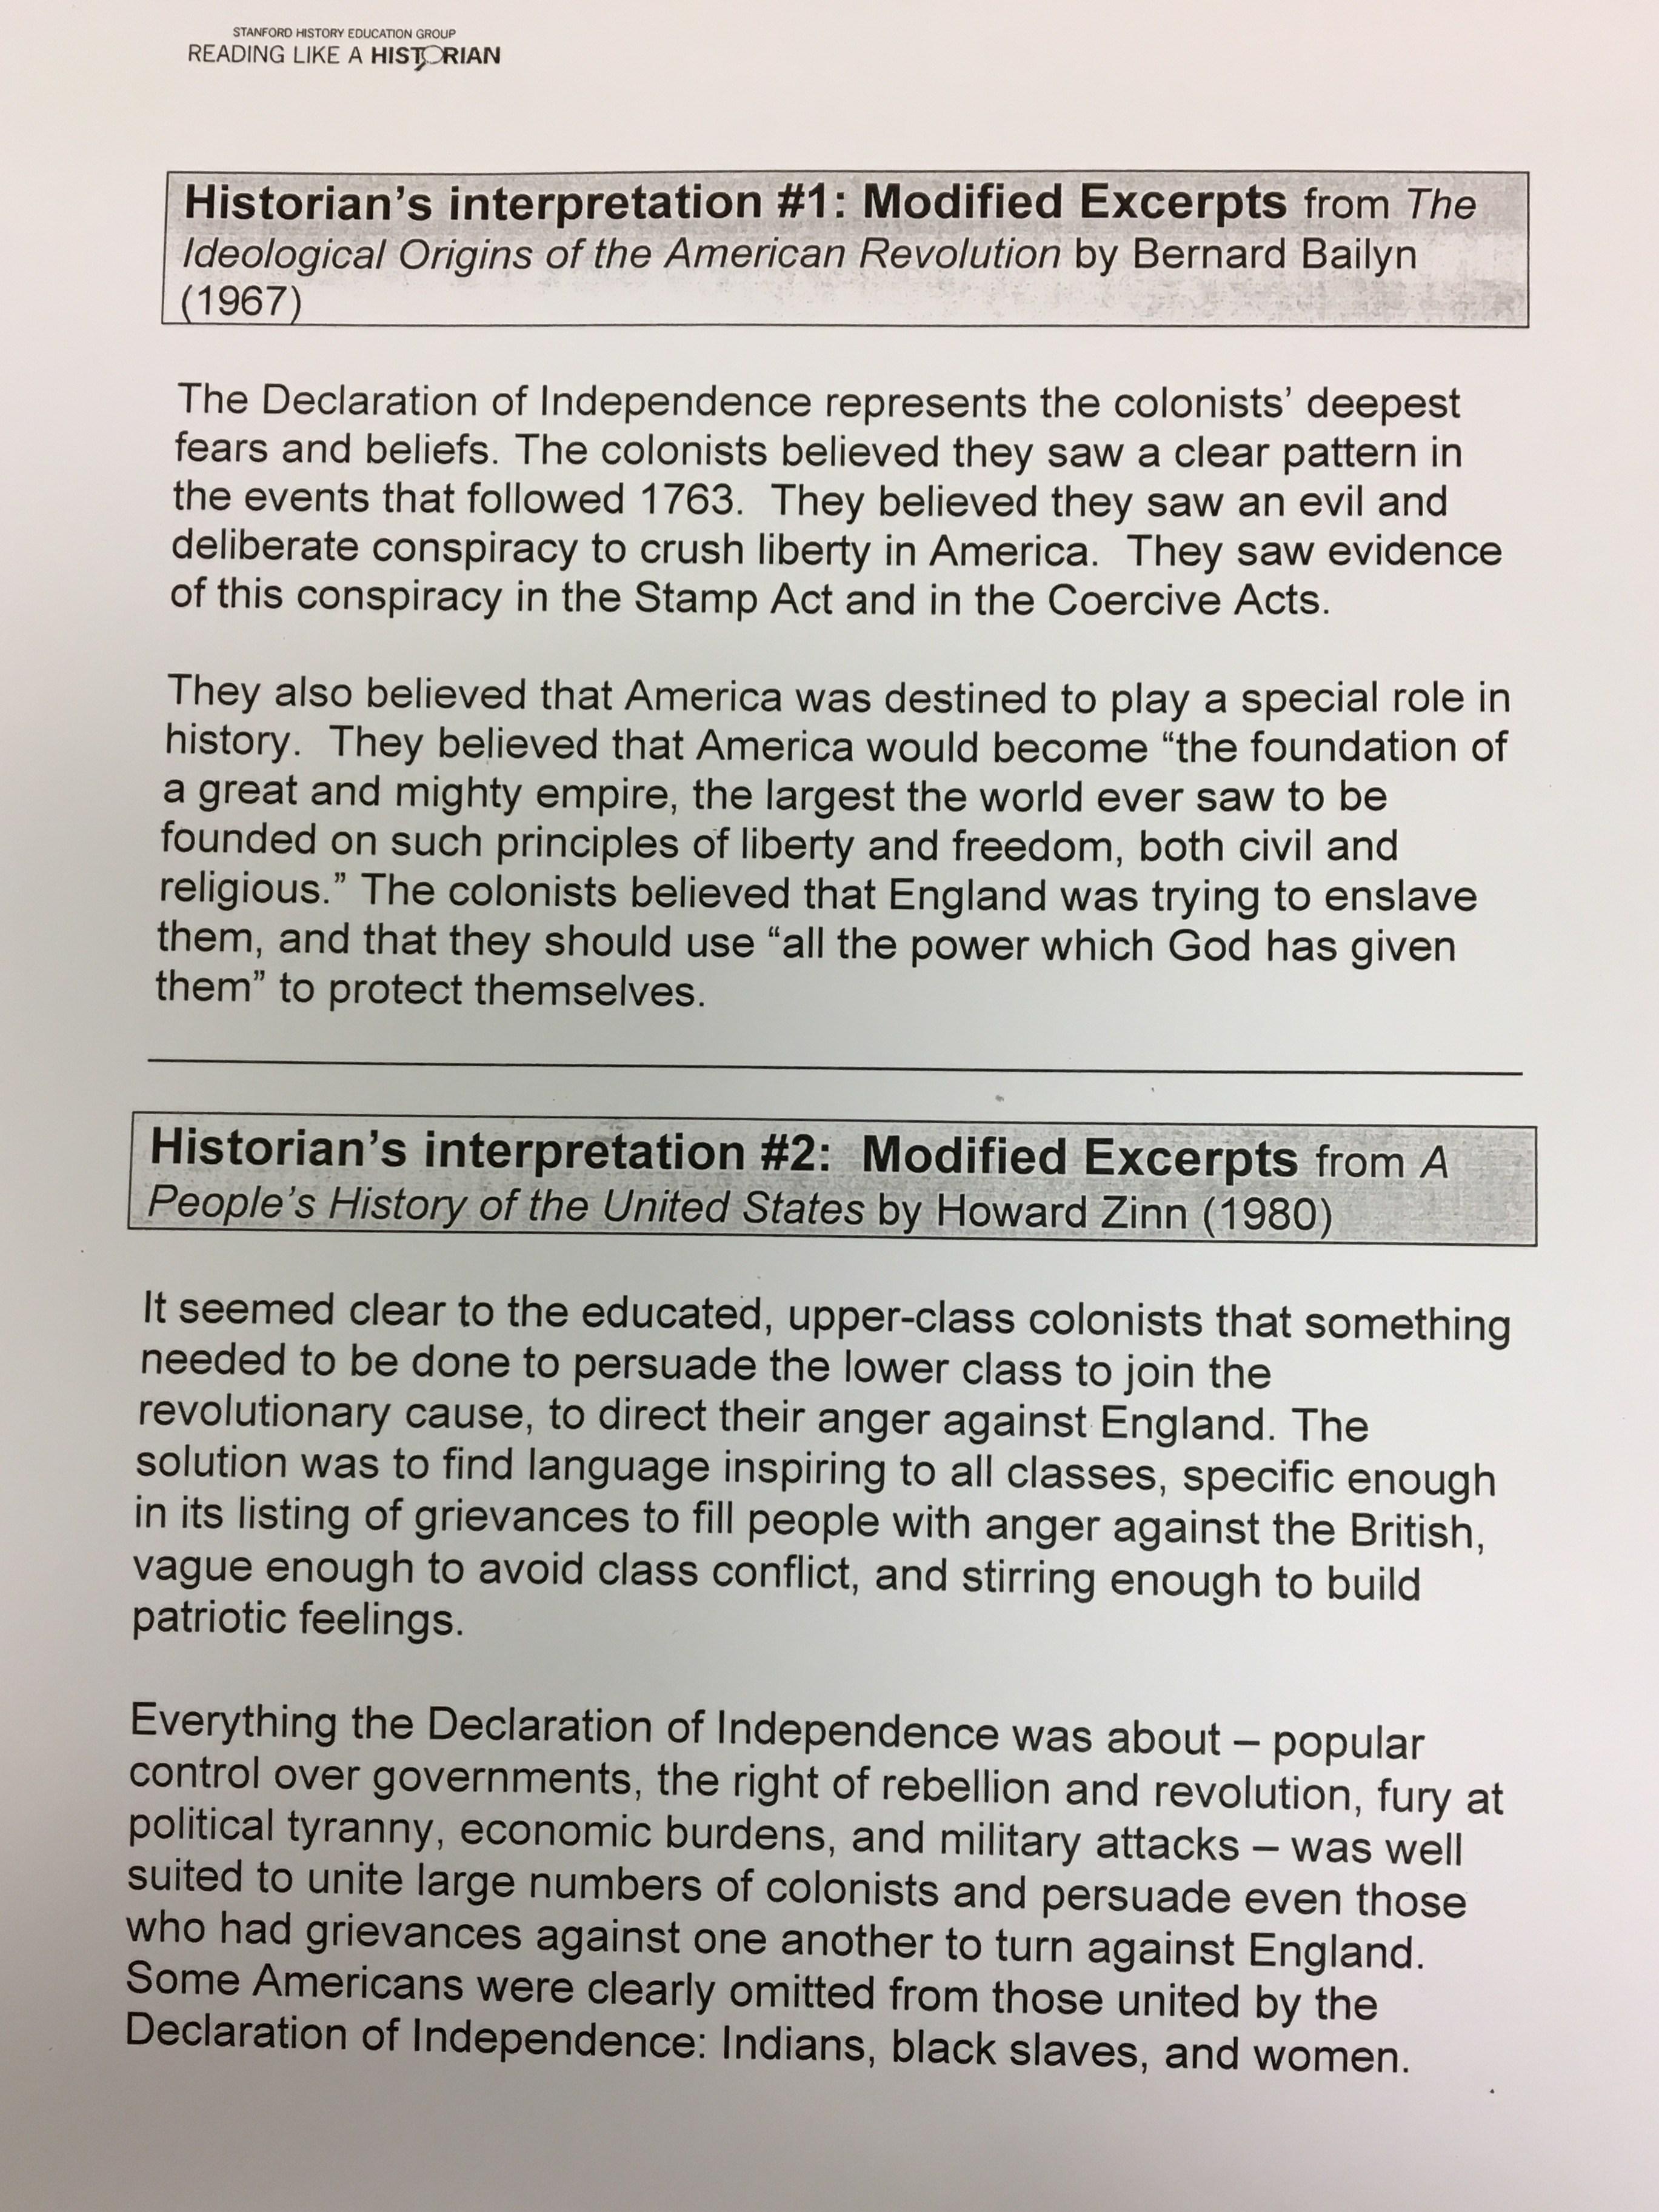 worksheet Declaration Of Independence Grievances Worksheet north park academy of the arts due wednesday october 18